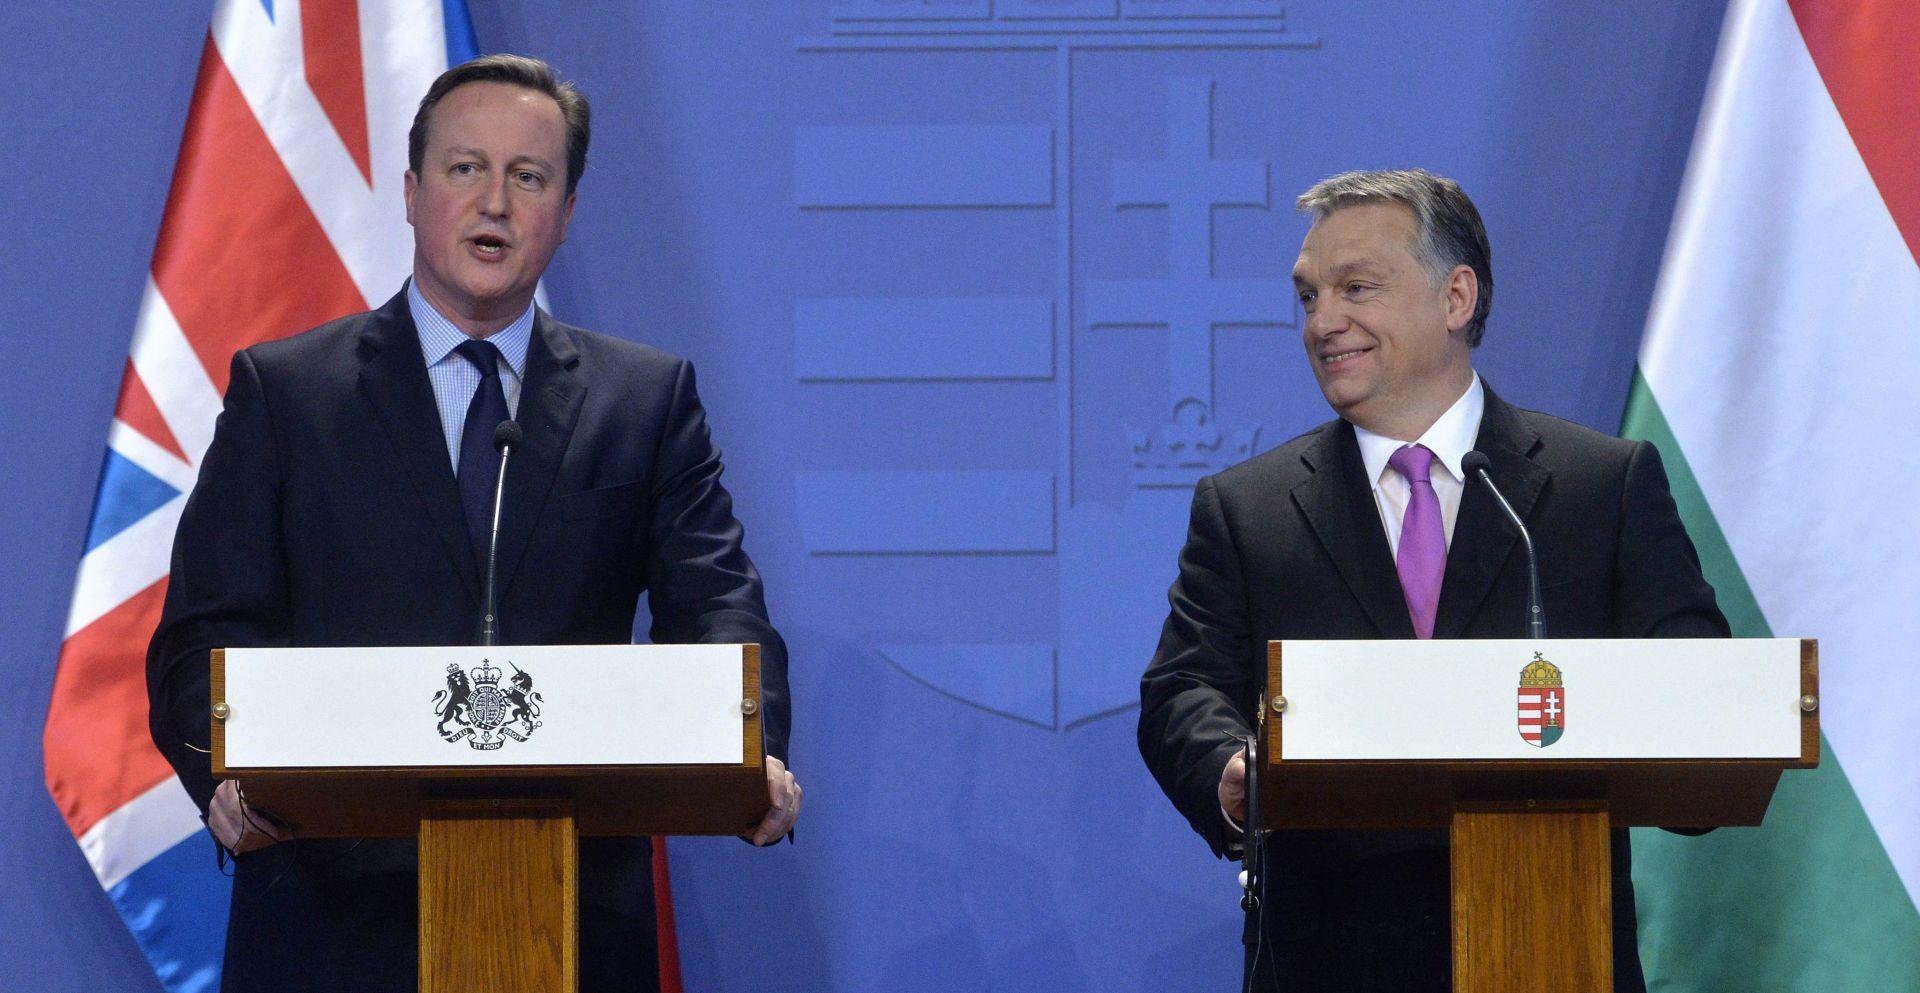 Orban: Moguć dogovor Britanije i V4 oko socijalnih davanja za migrante iz EU-a